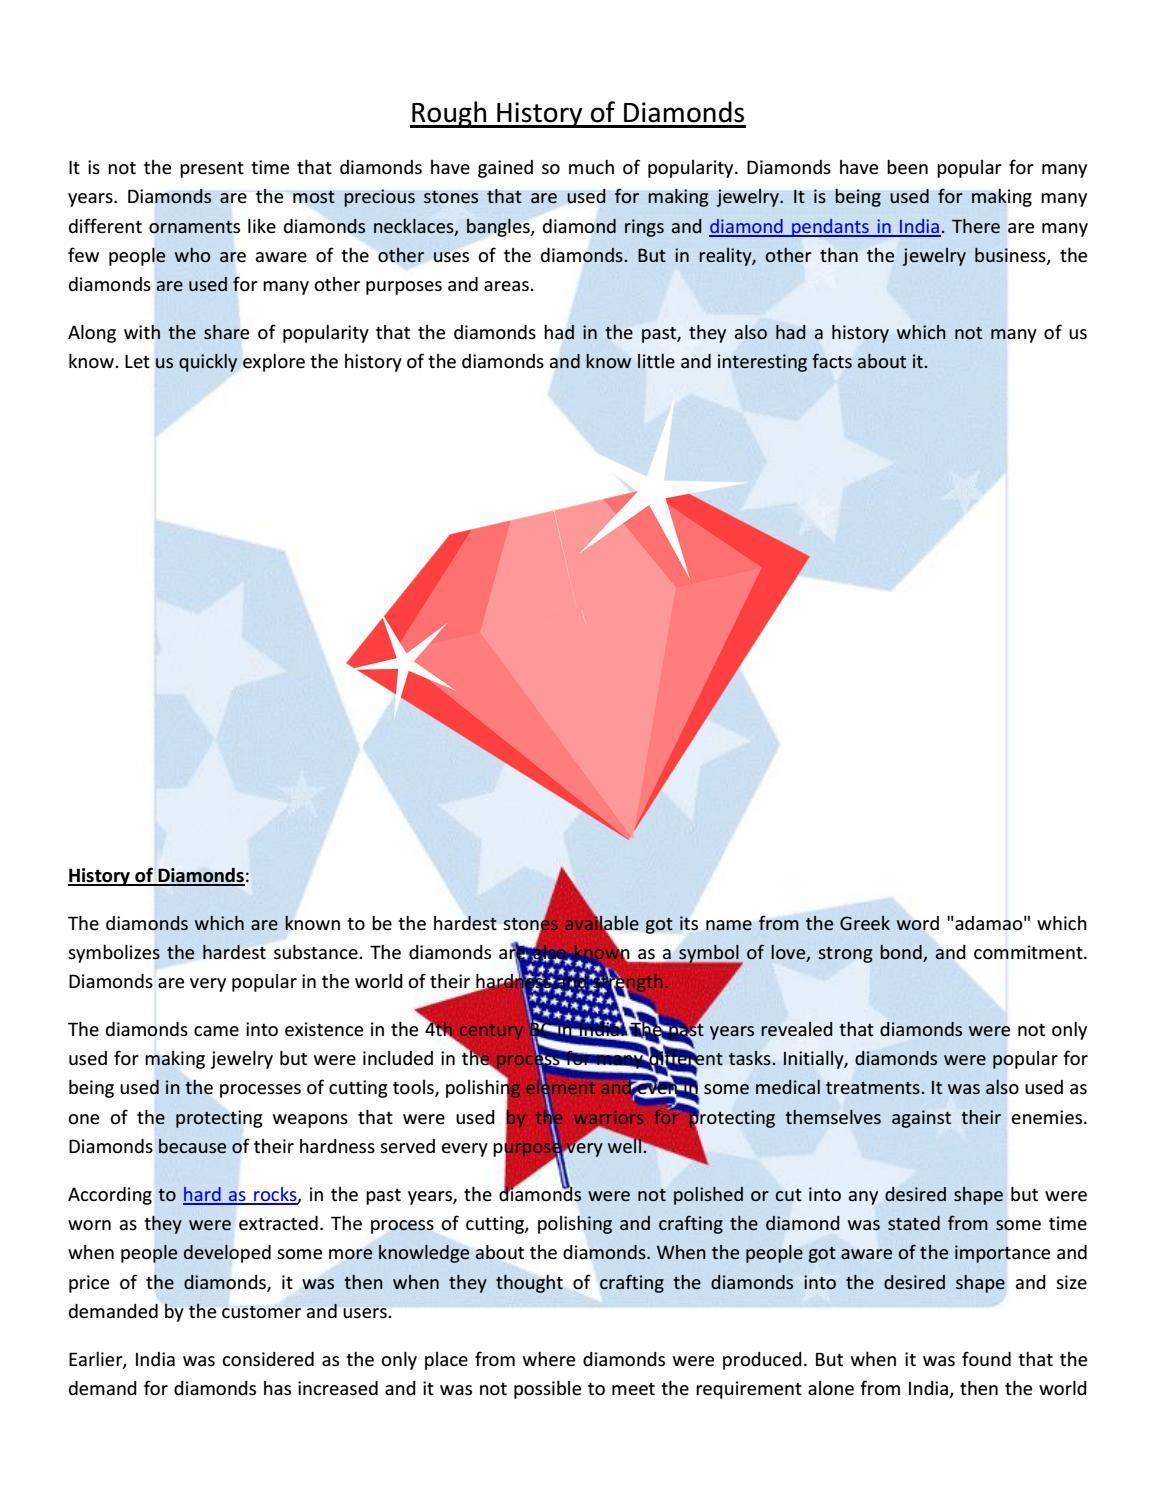 Rough history of diamonds by i love free software issuu biocorpaavc Gallery